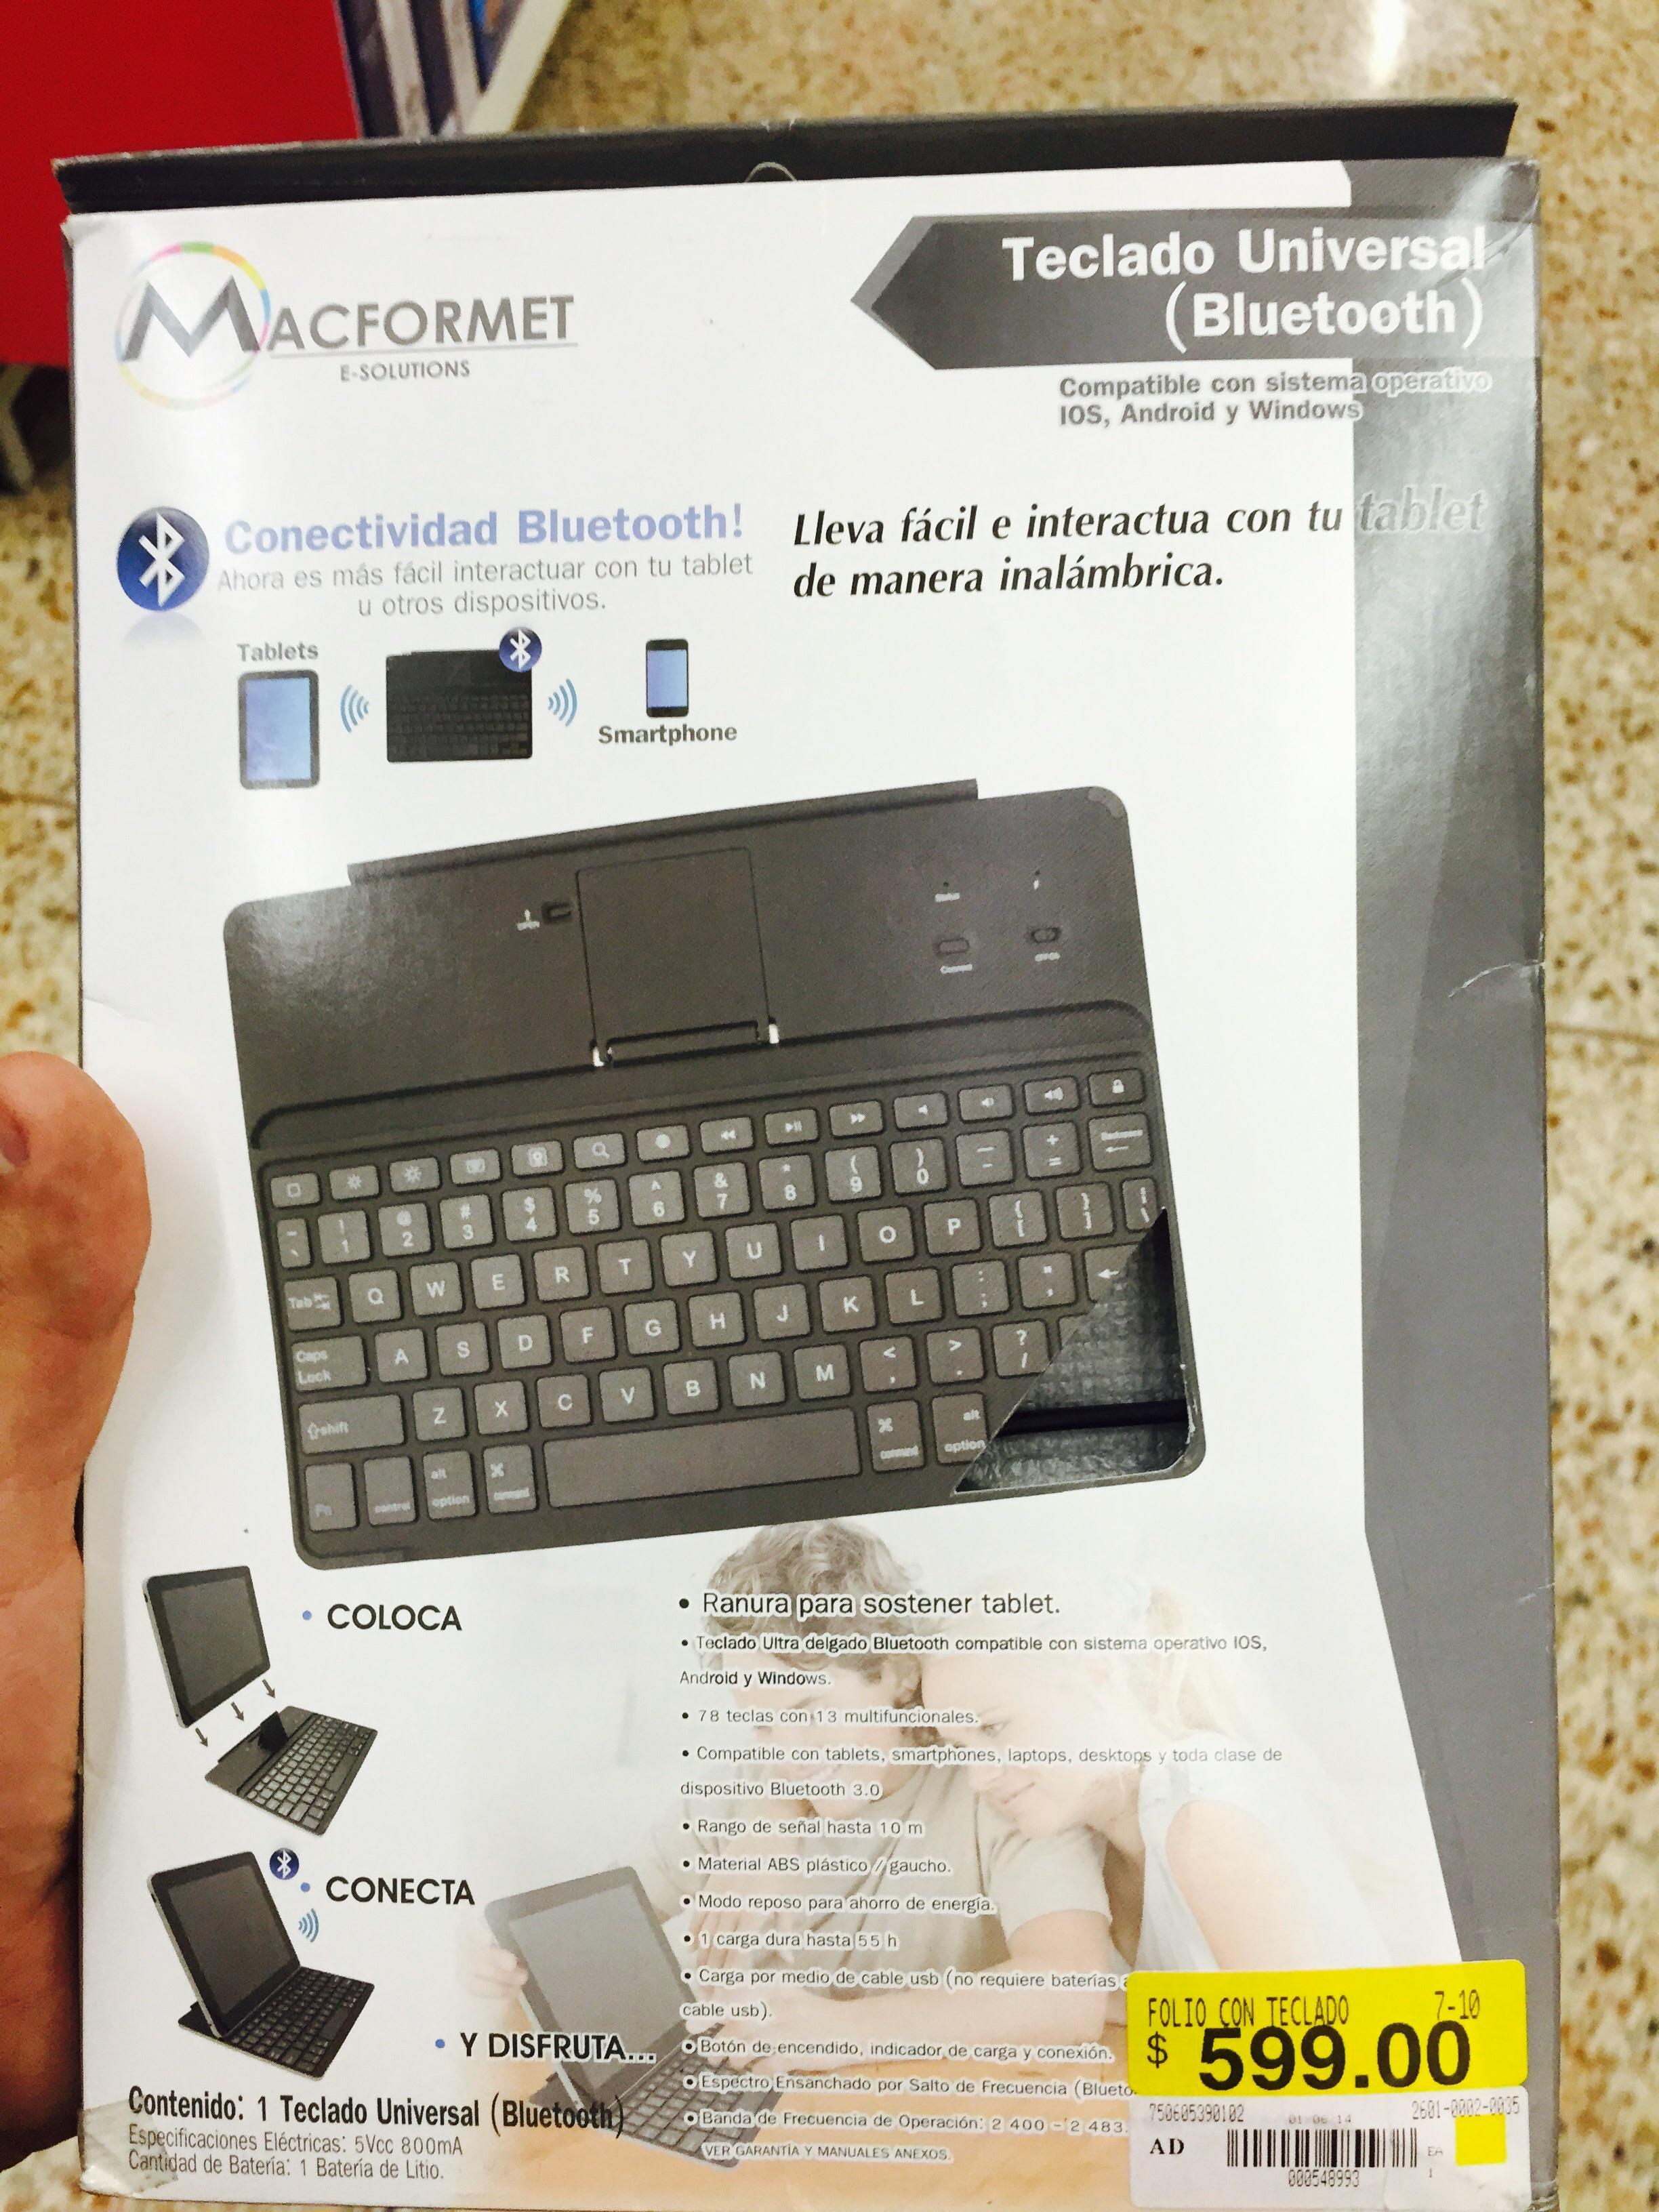 Walmart: Teclado Bluetooth universal marca Macformet de $599 a $59